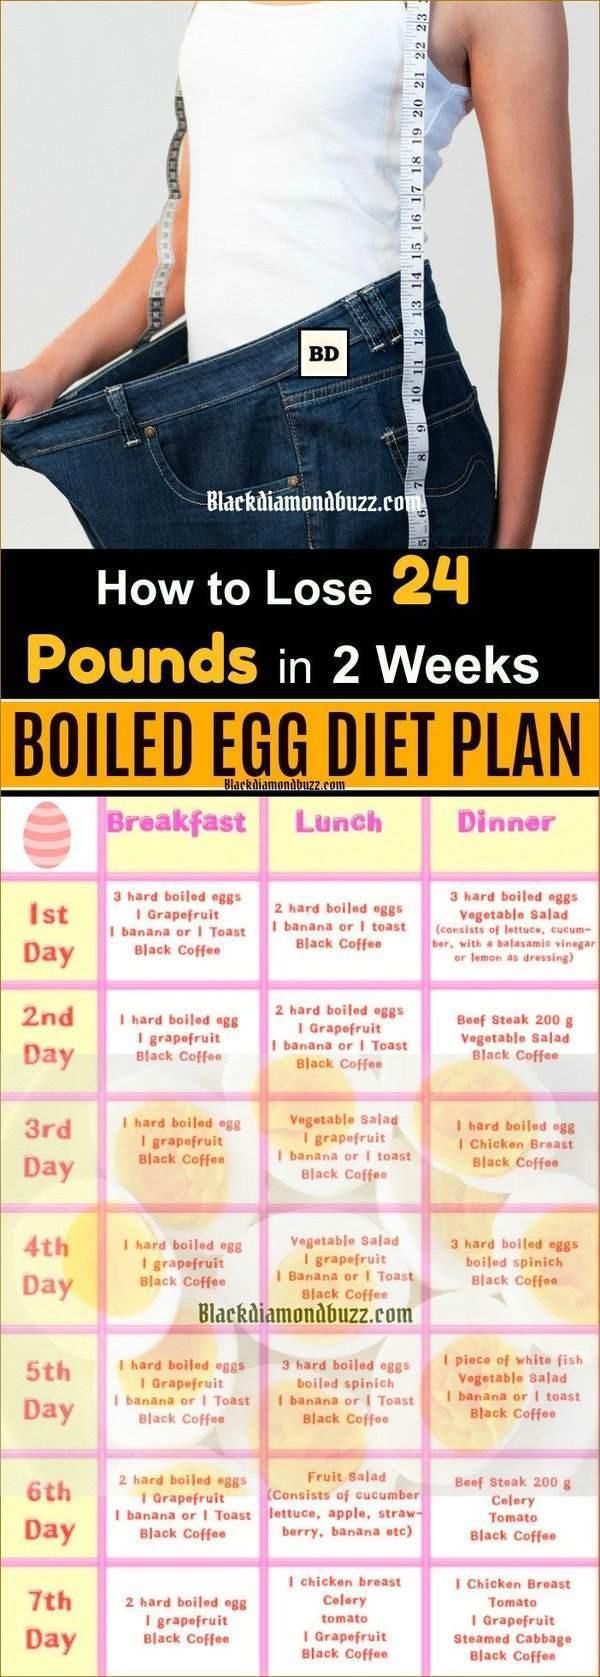 Egg Diet Recipes For Weight Loss  Boiled Egg Diet Recipes for Weight Loss at Home 14 Day